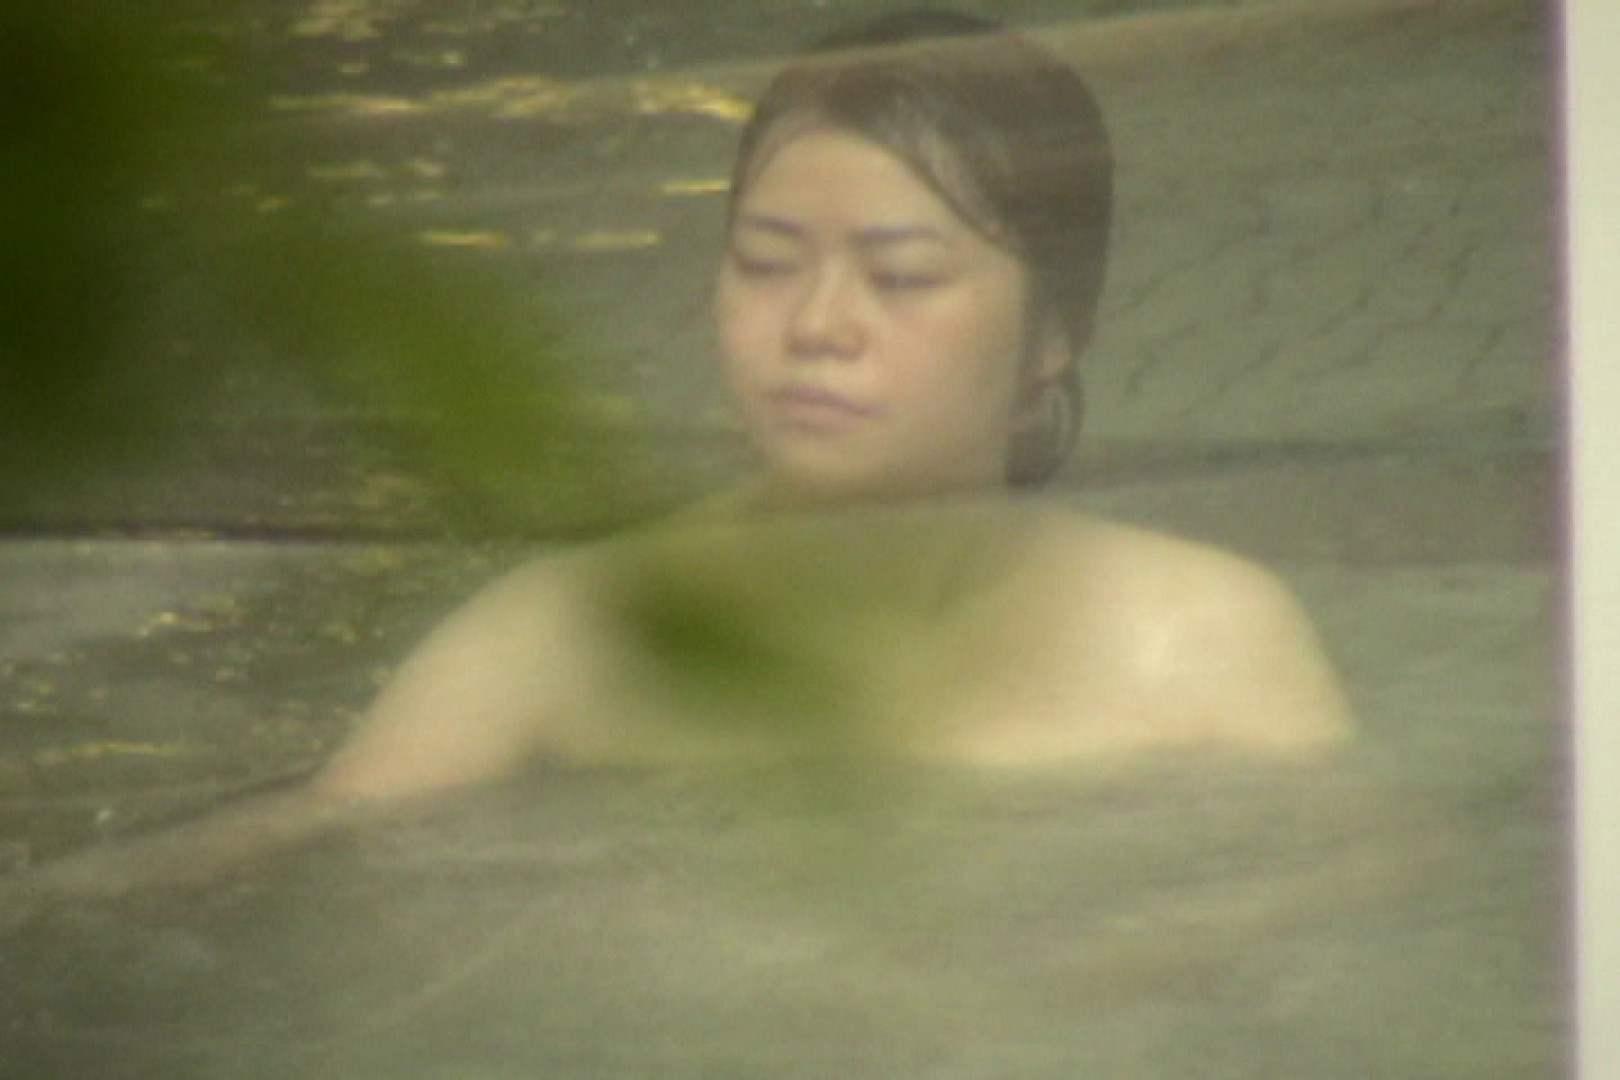 Aquaな露天風呂Vol.456 盗撮 | HなOL  102pic 66